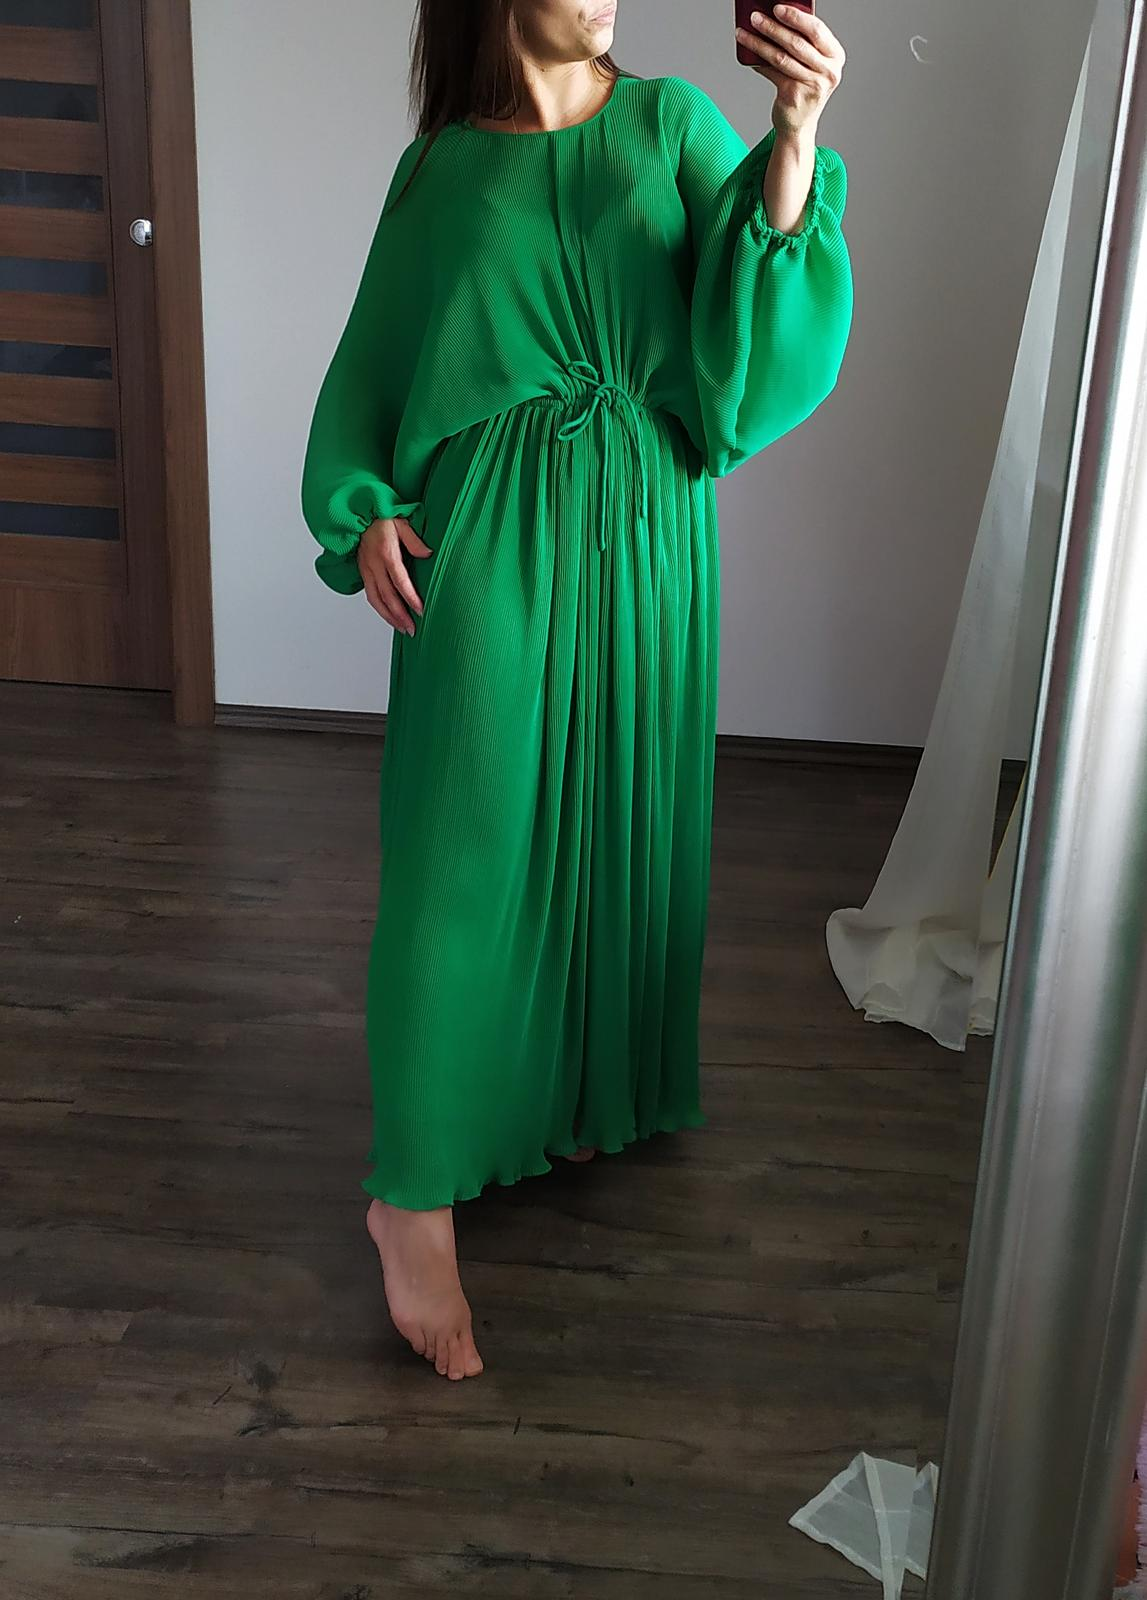 šaty Zara XS-S - Obrázek č. 3